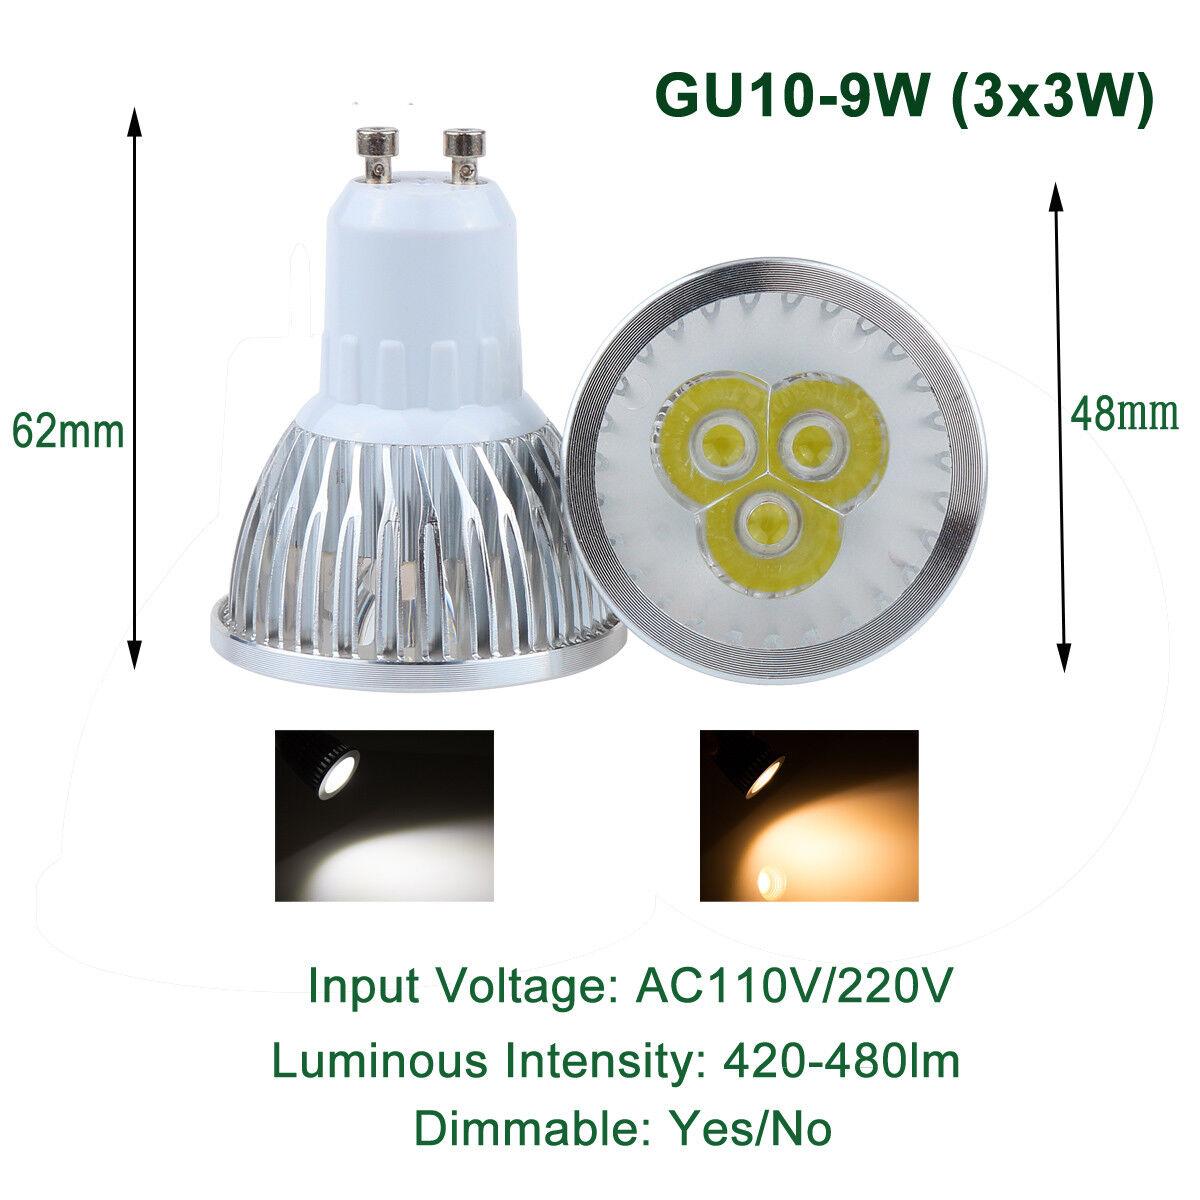 Dimmerabile GU10 LED Spot LAMPADA LAMPADINA LAMPADINA LAMPADINA 9W 12W 15W FARETTO DA INCASSO Luce 570f26